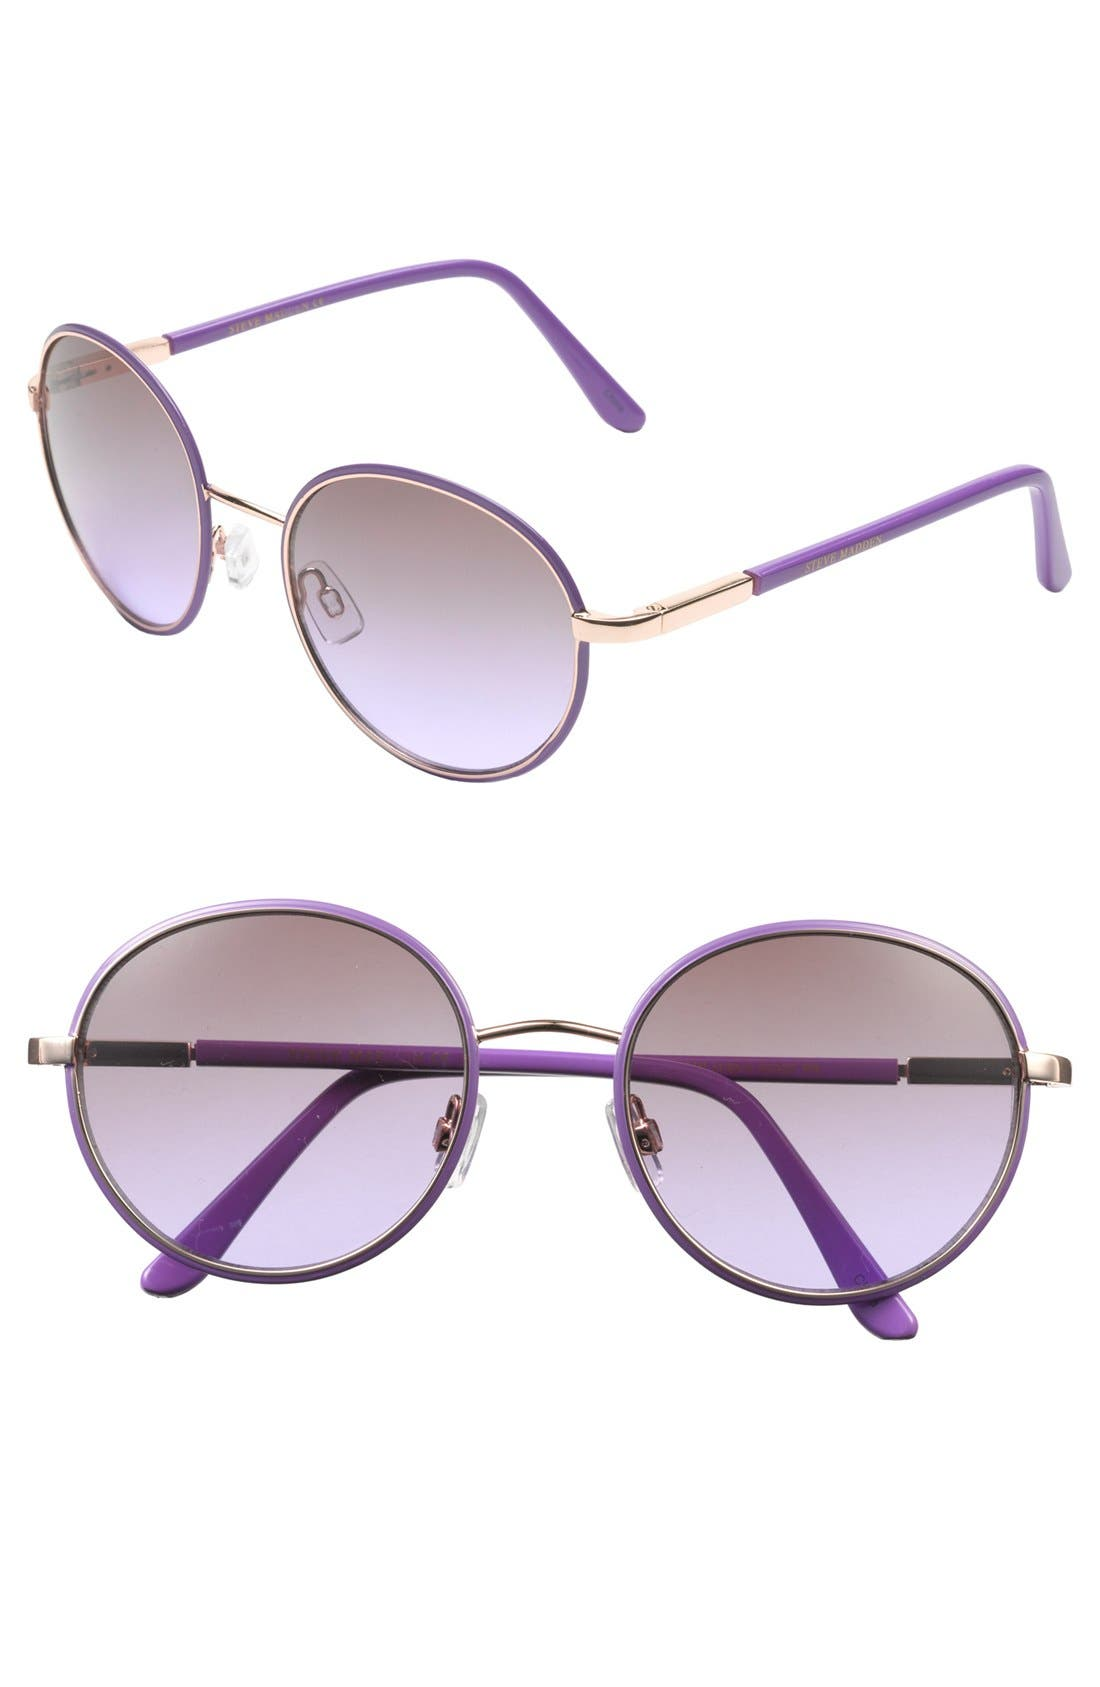 Main Image - Steve Madden Oval Sunglasses